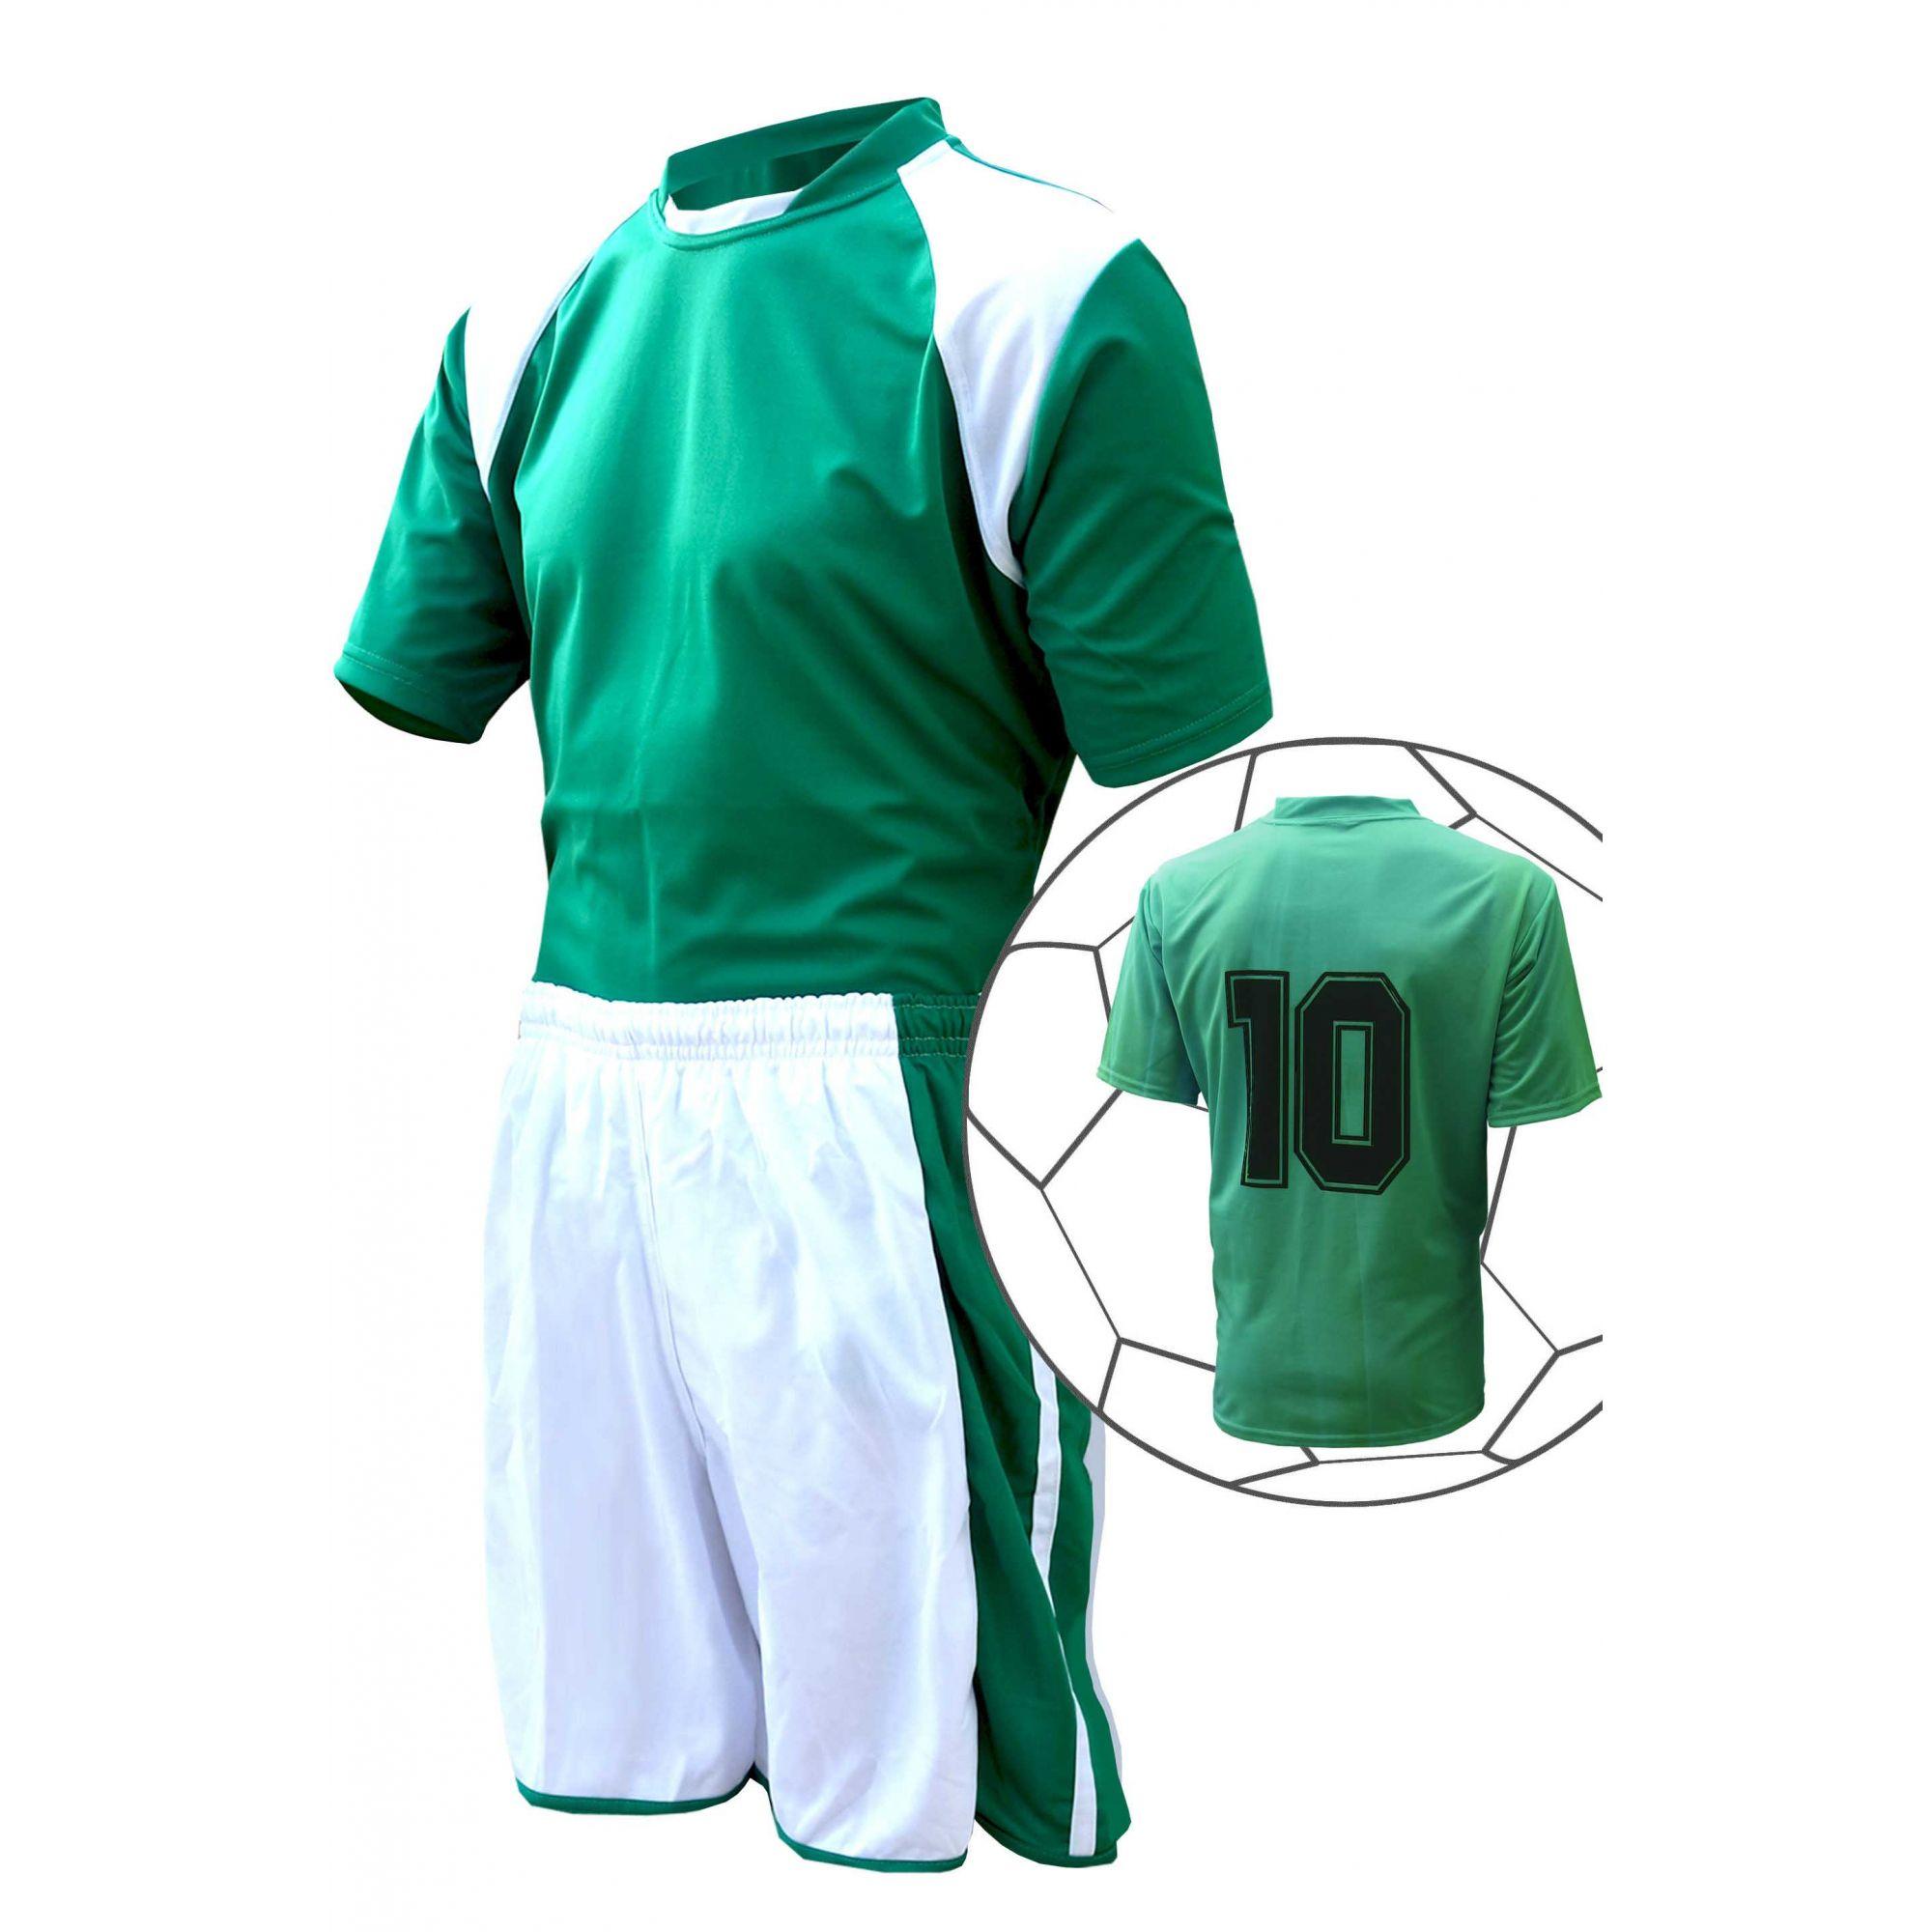 Uniforme de Futebol 14 + 1 Avante Ligth